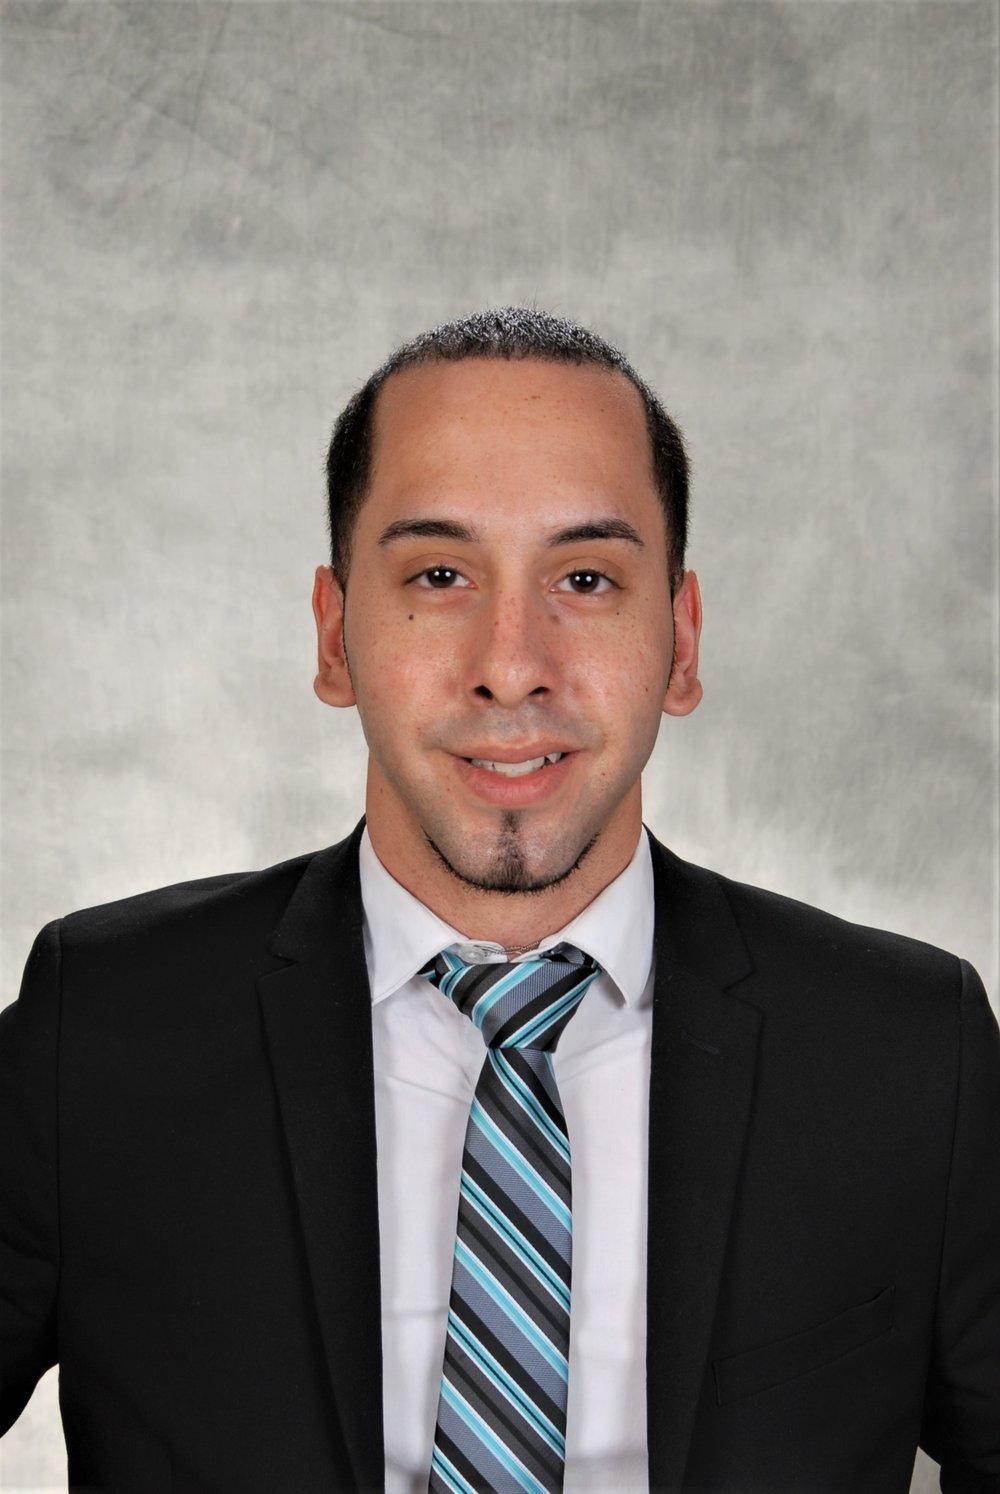 Edward Ramos - VP of Education